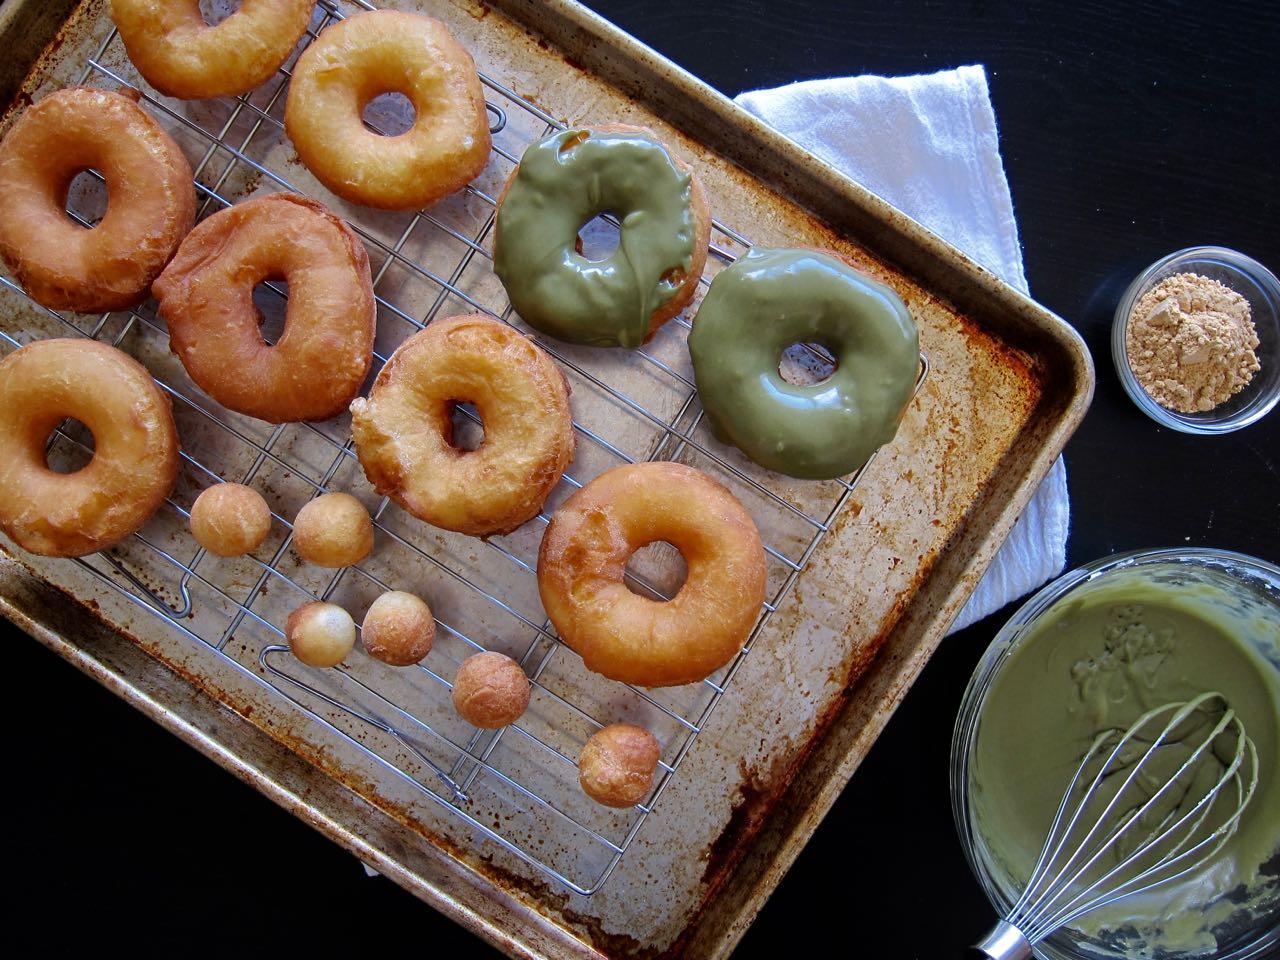 glazing donuts